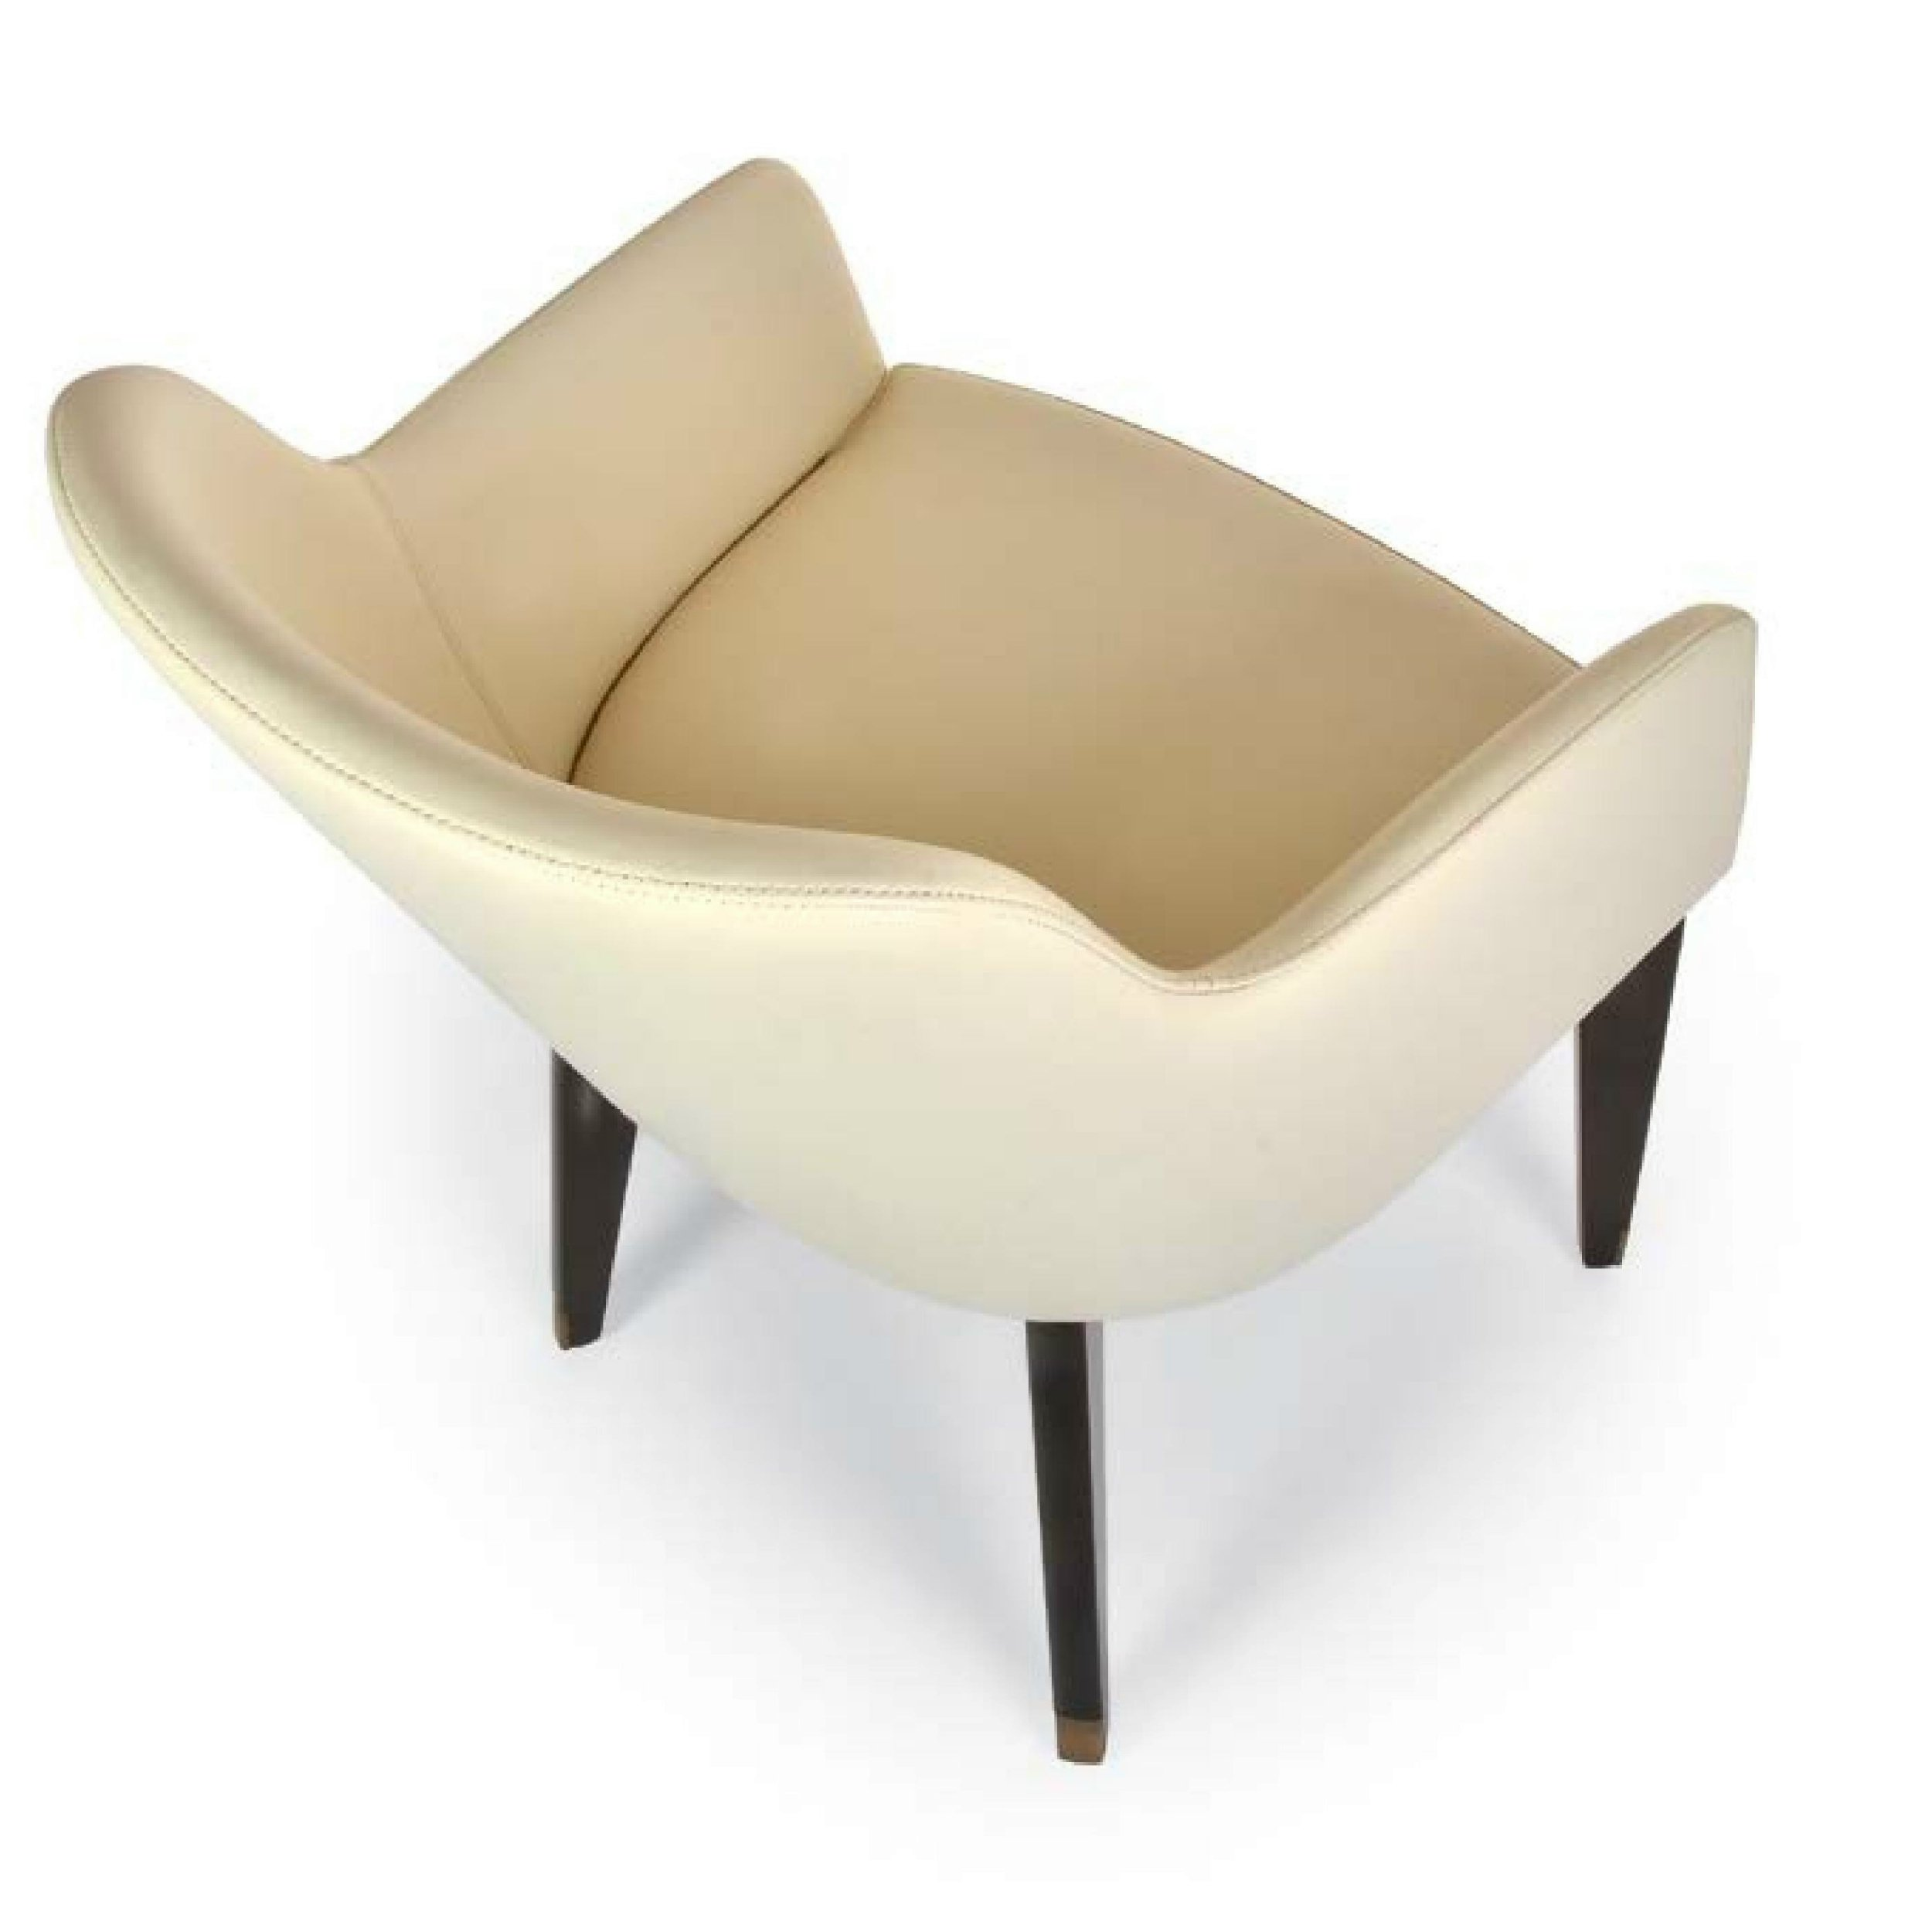 marl ne wood chaise en cuir by riccardo rivoli design. Black Bedroom Furniture Sets. Home Design Ideas